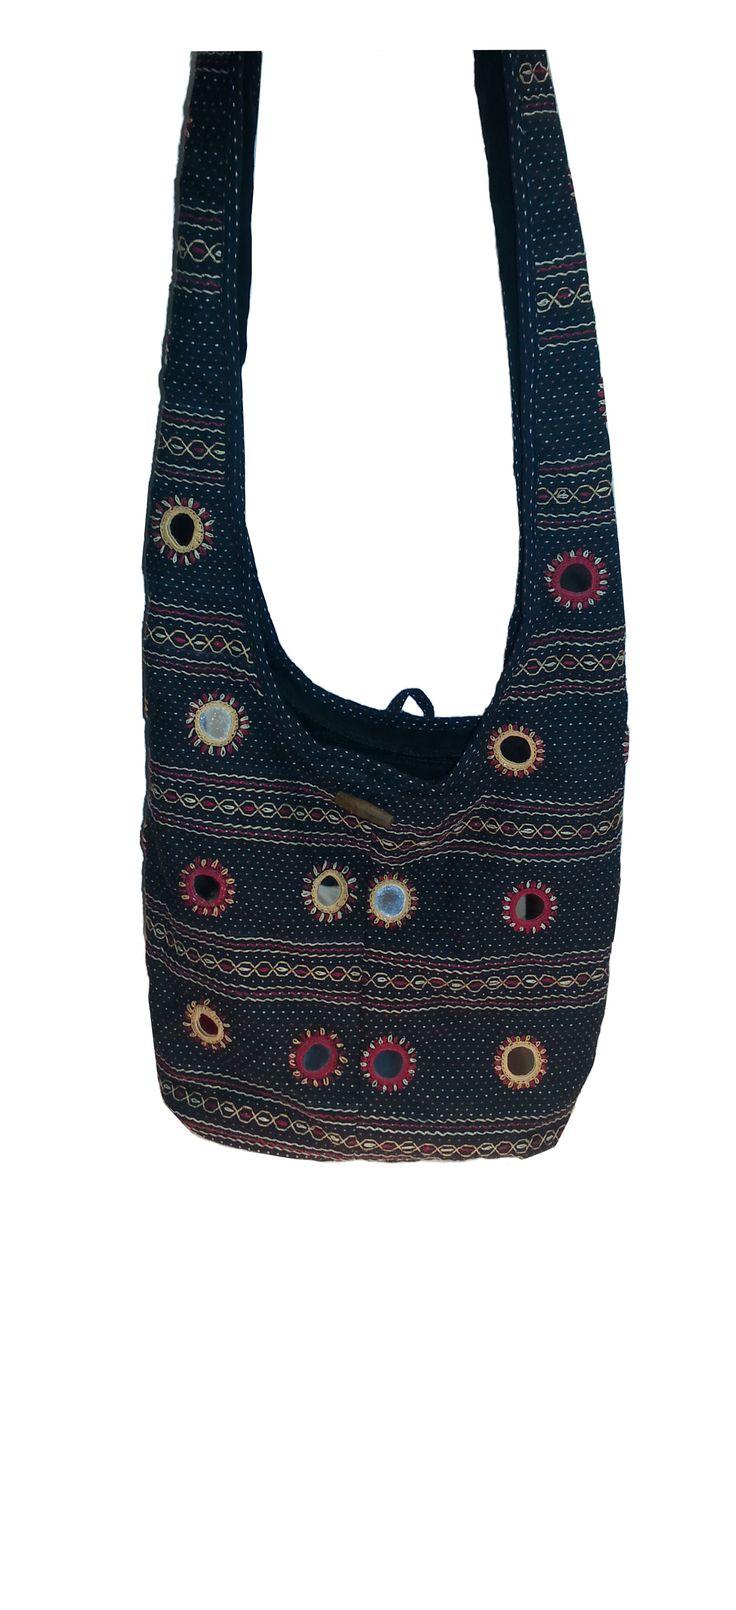 Sabala Handicrafts Jolly Jhola Black $24.99